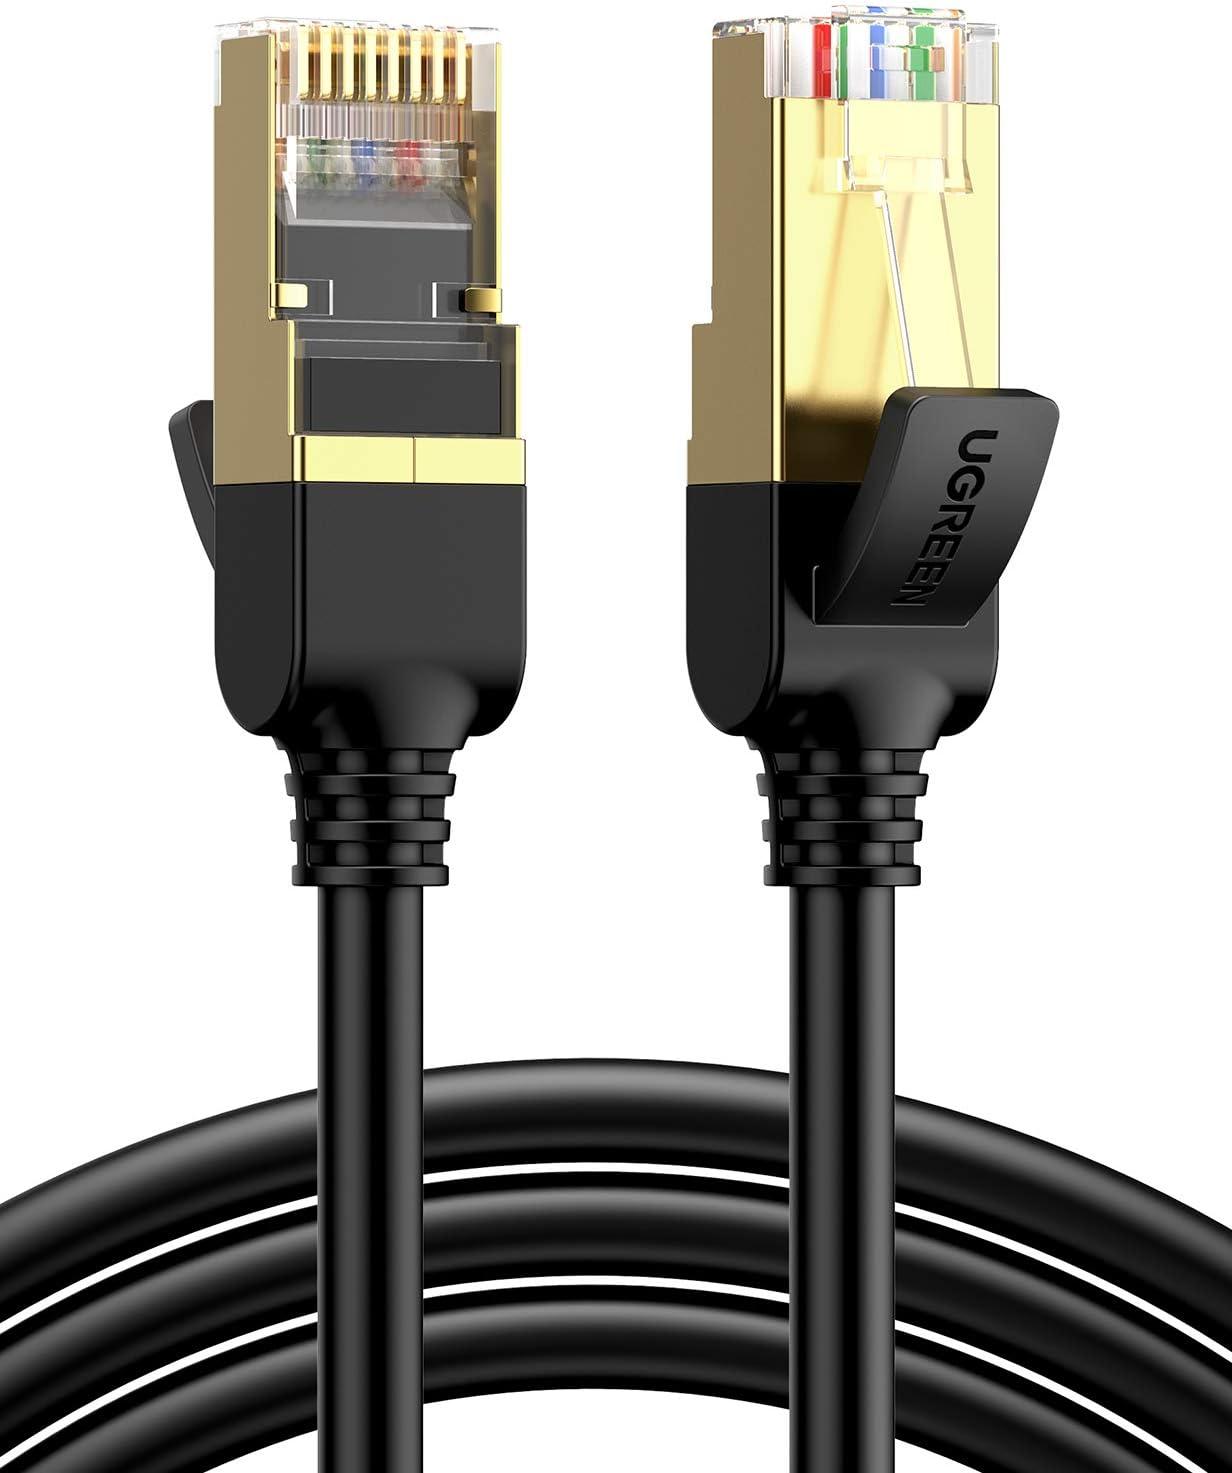 PC Router Laptop Ethernet Cable RJ45 Cat7 LAN Cable STP RJ 45 Flat Network Cable Patch Cord for Modem Patch Panel TV